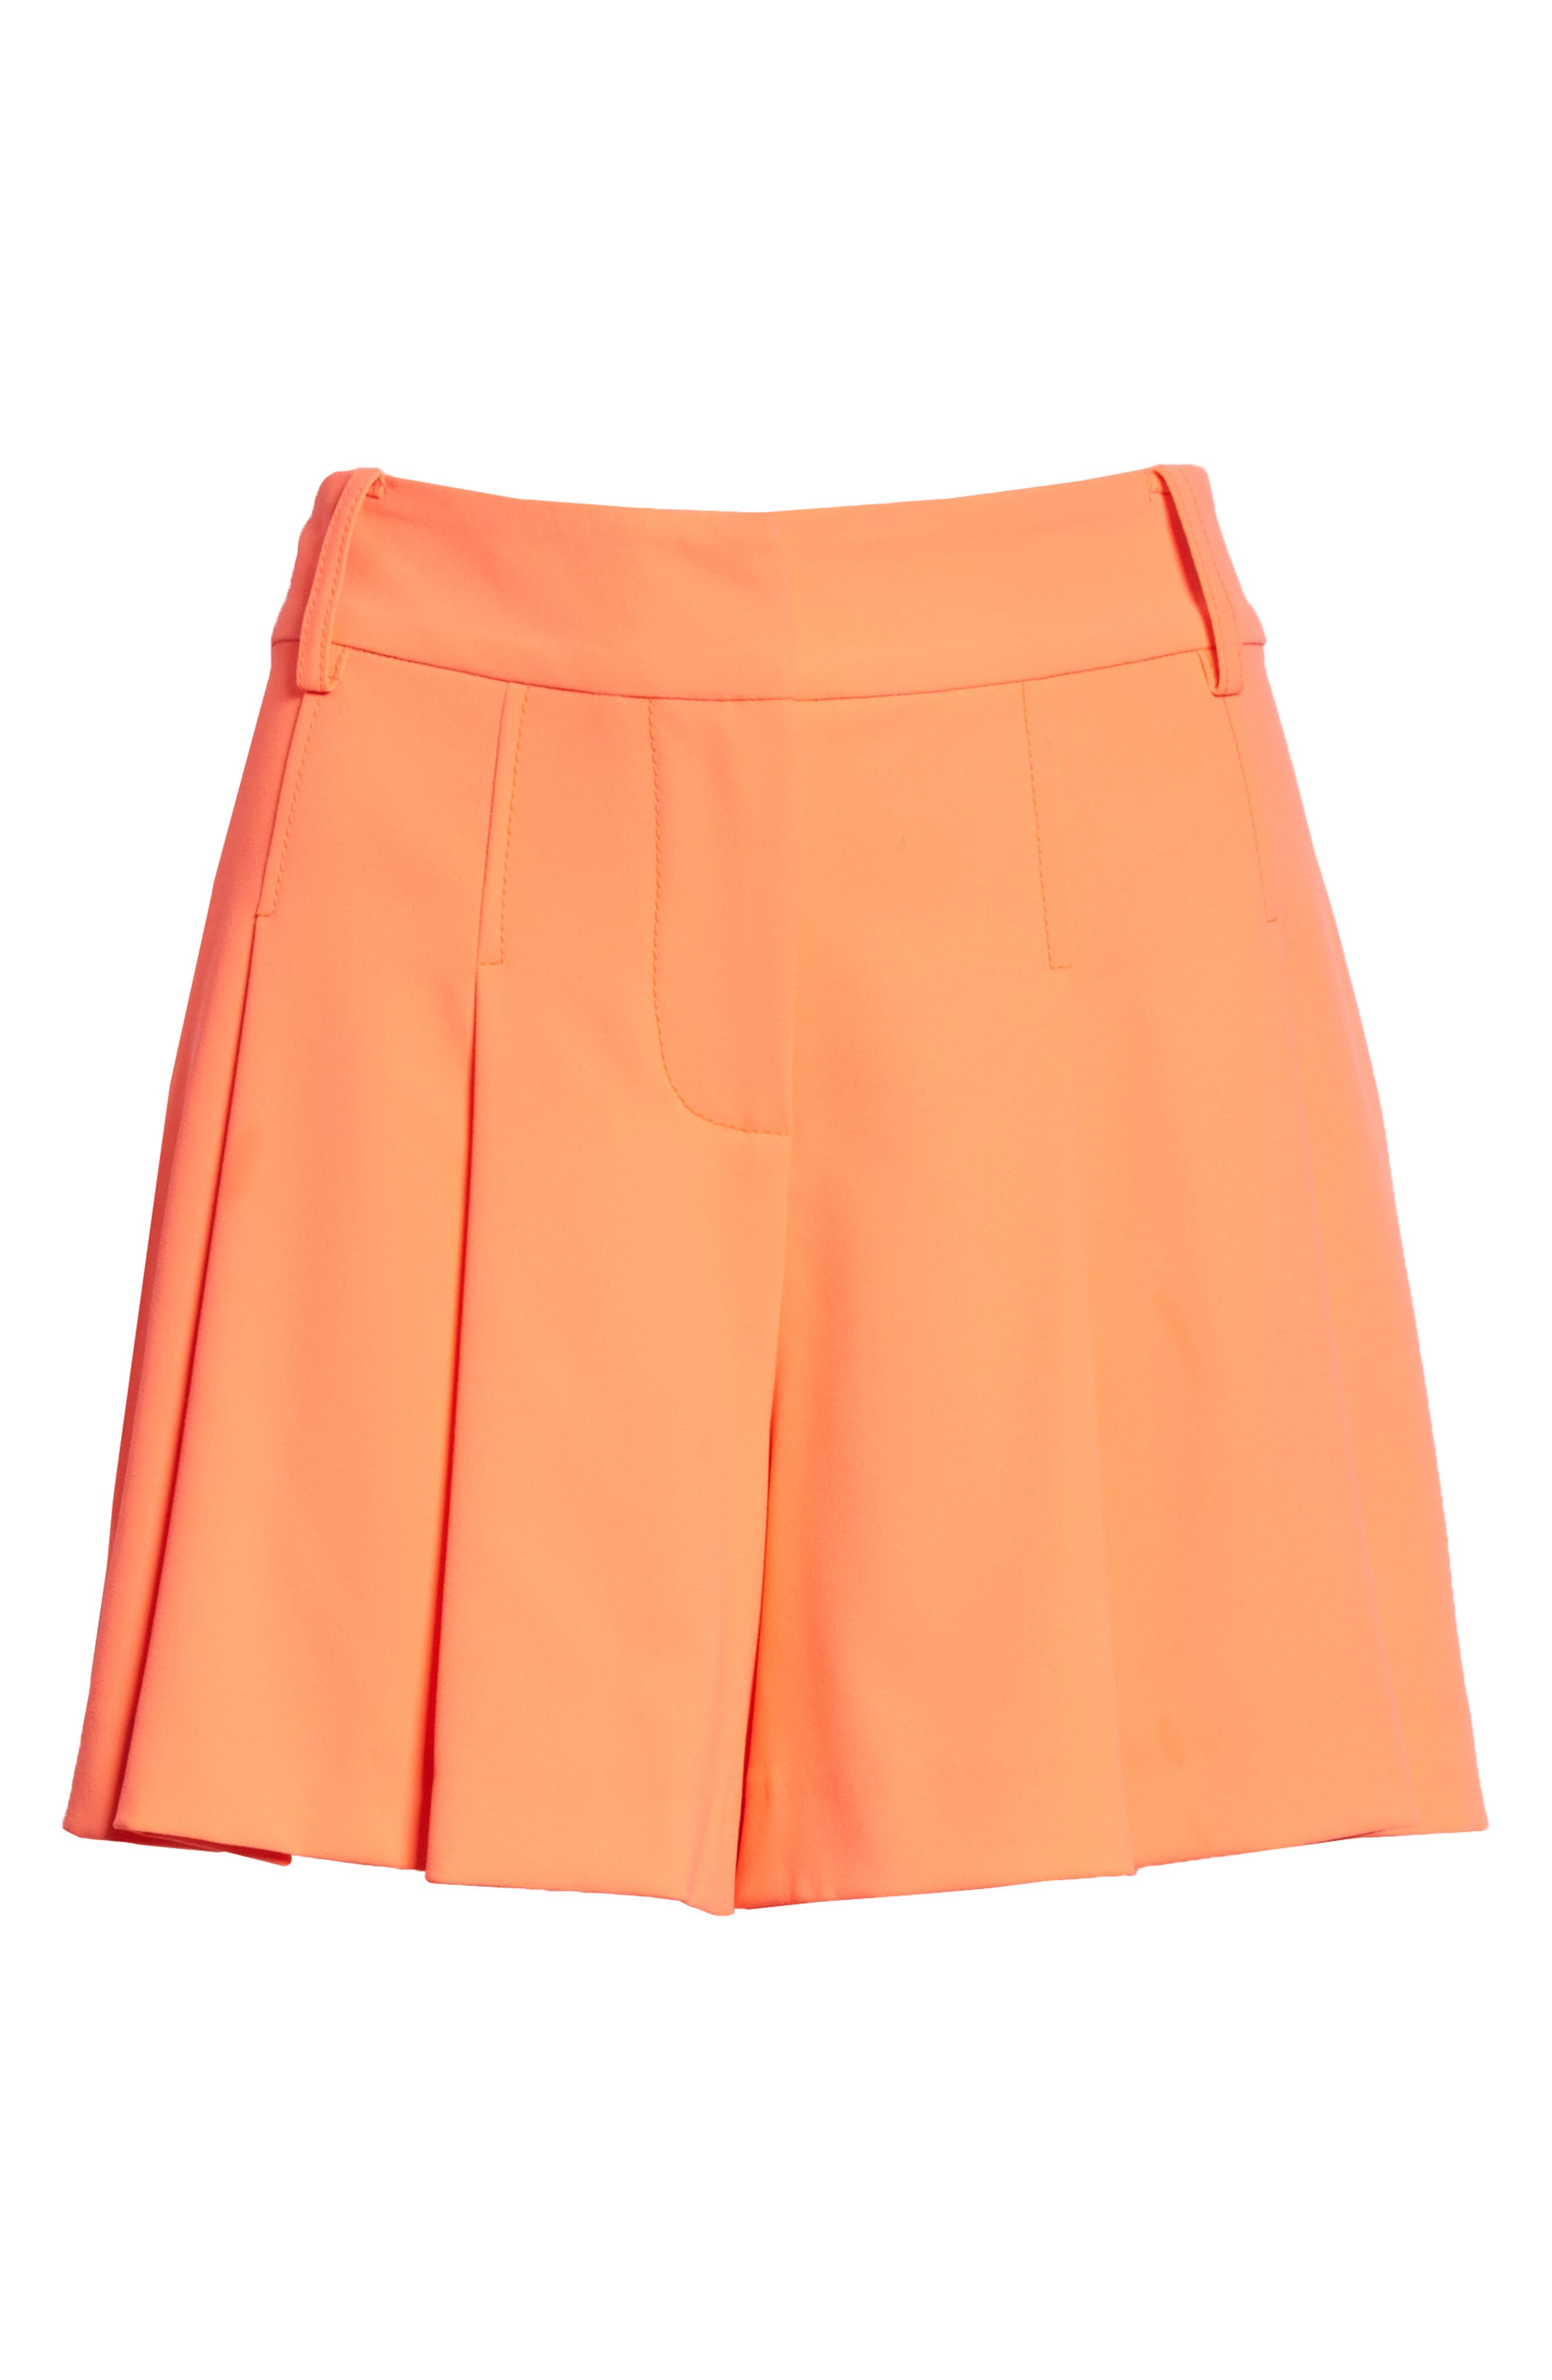 Scarlet Flutter Shorts,                             Alternate thumbnail 6, color,                             Neon Coral